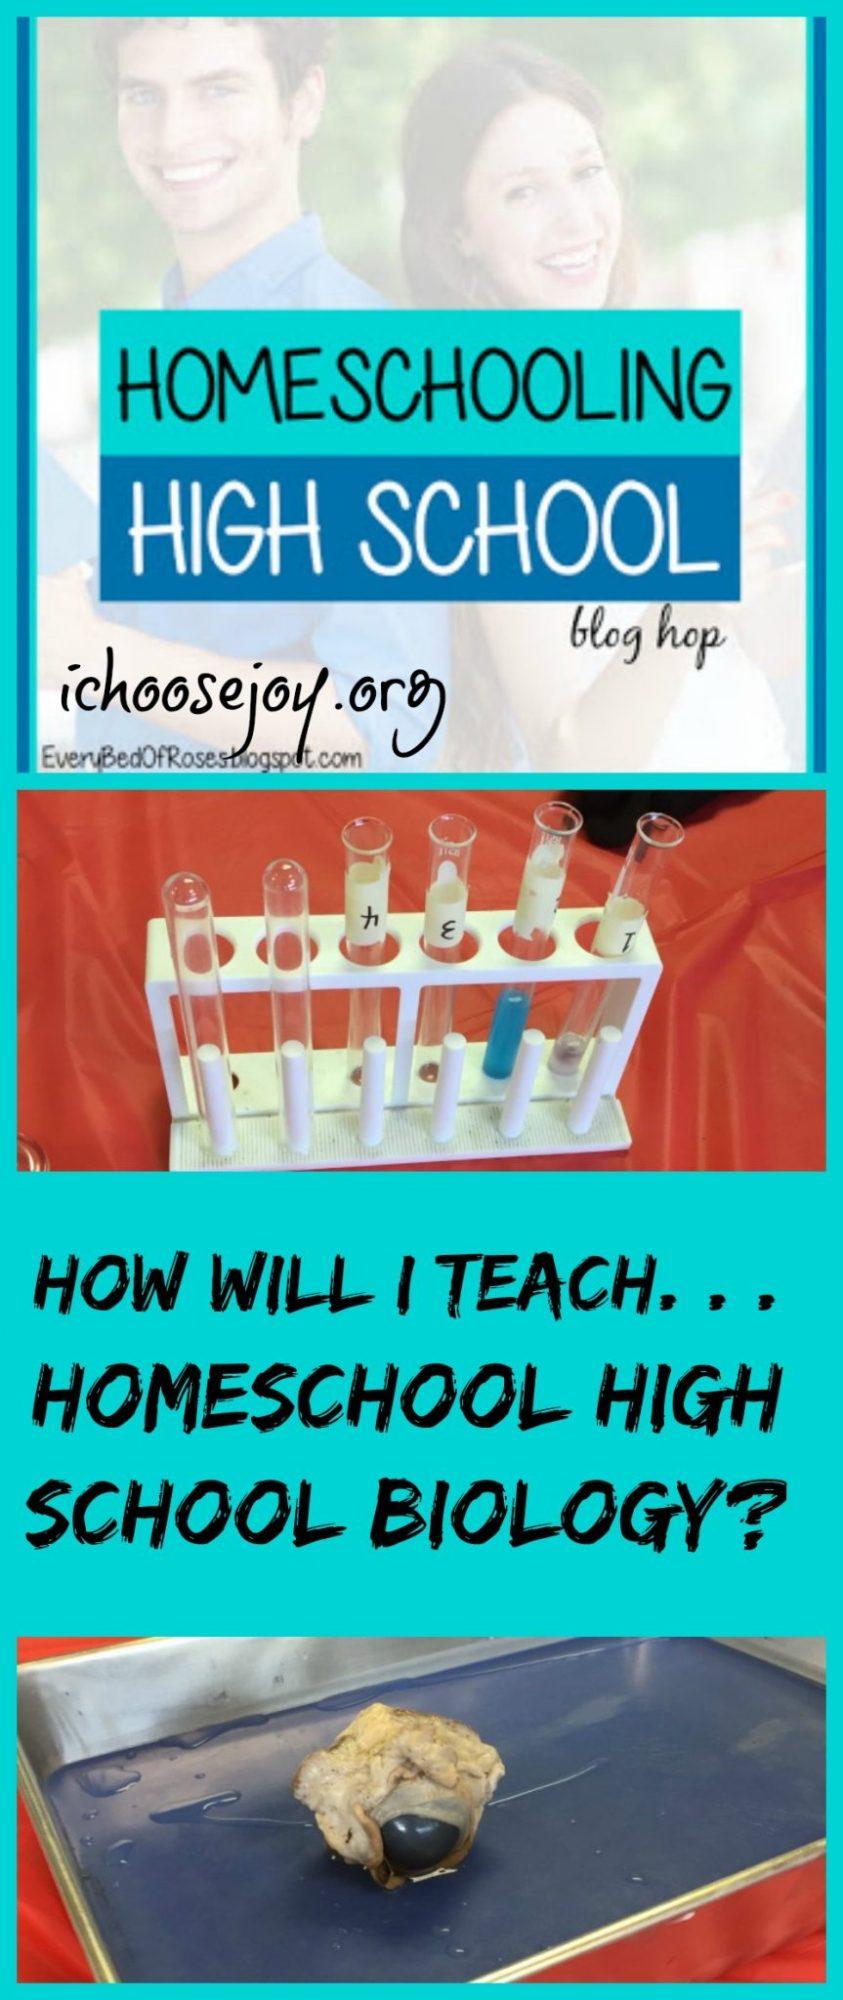 How Will I Teach. . . Homeschool High School Biology?